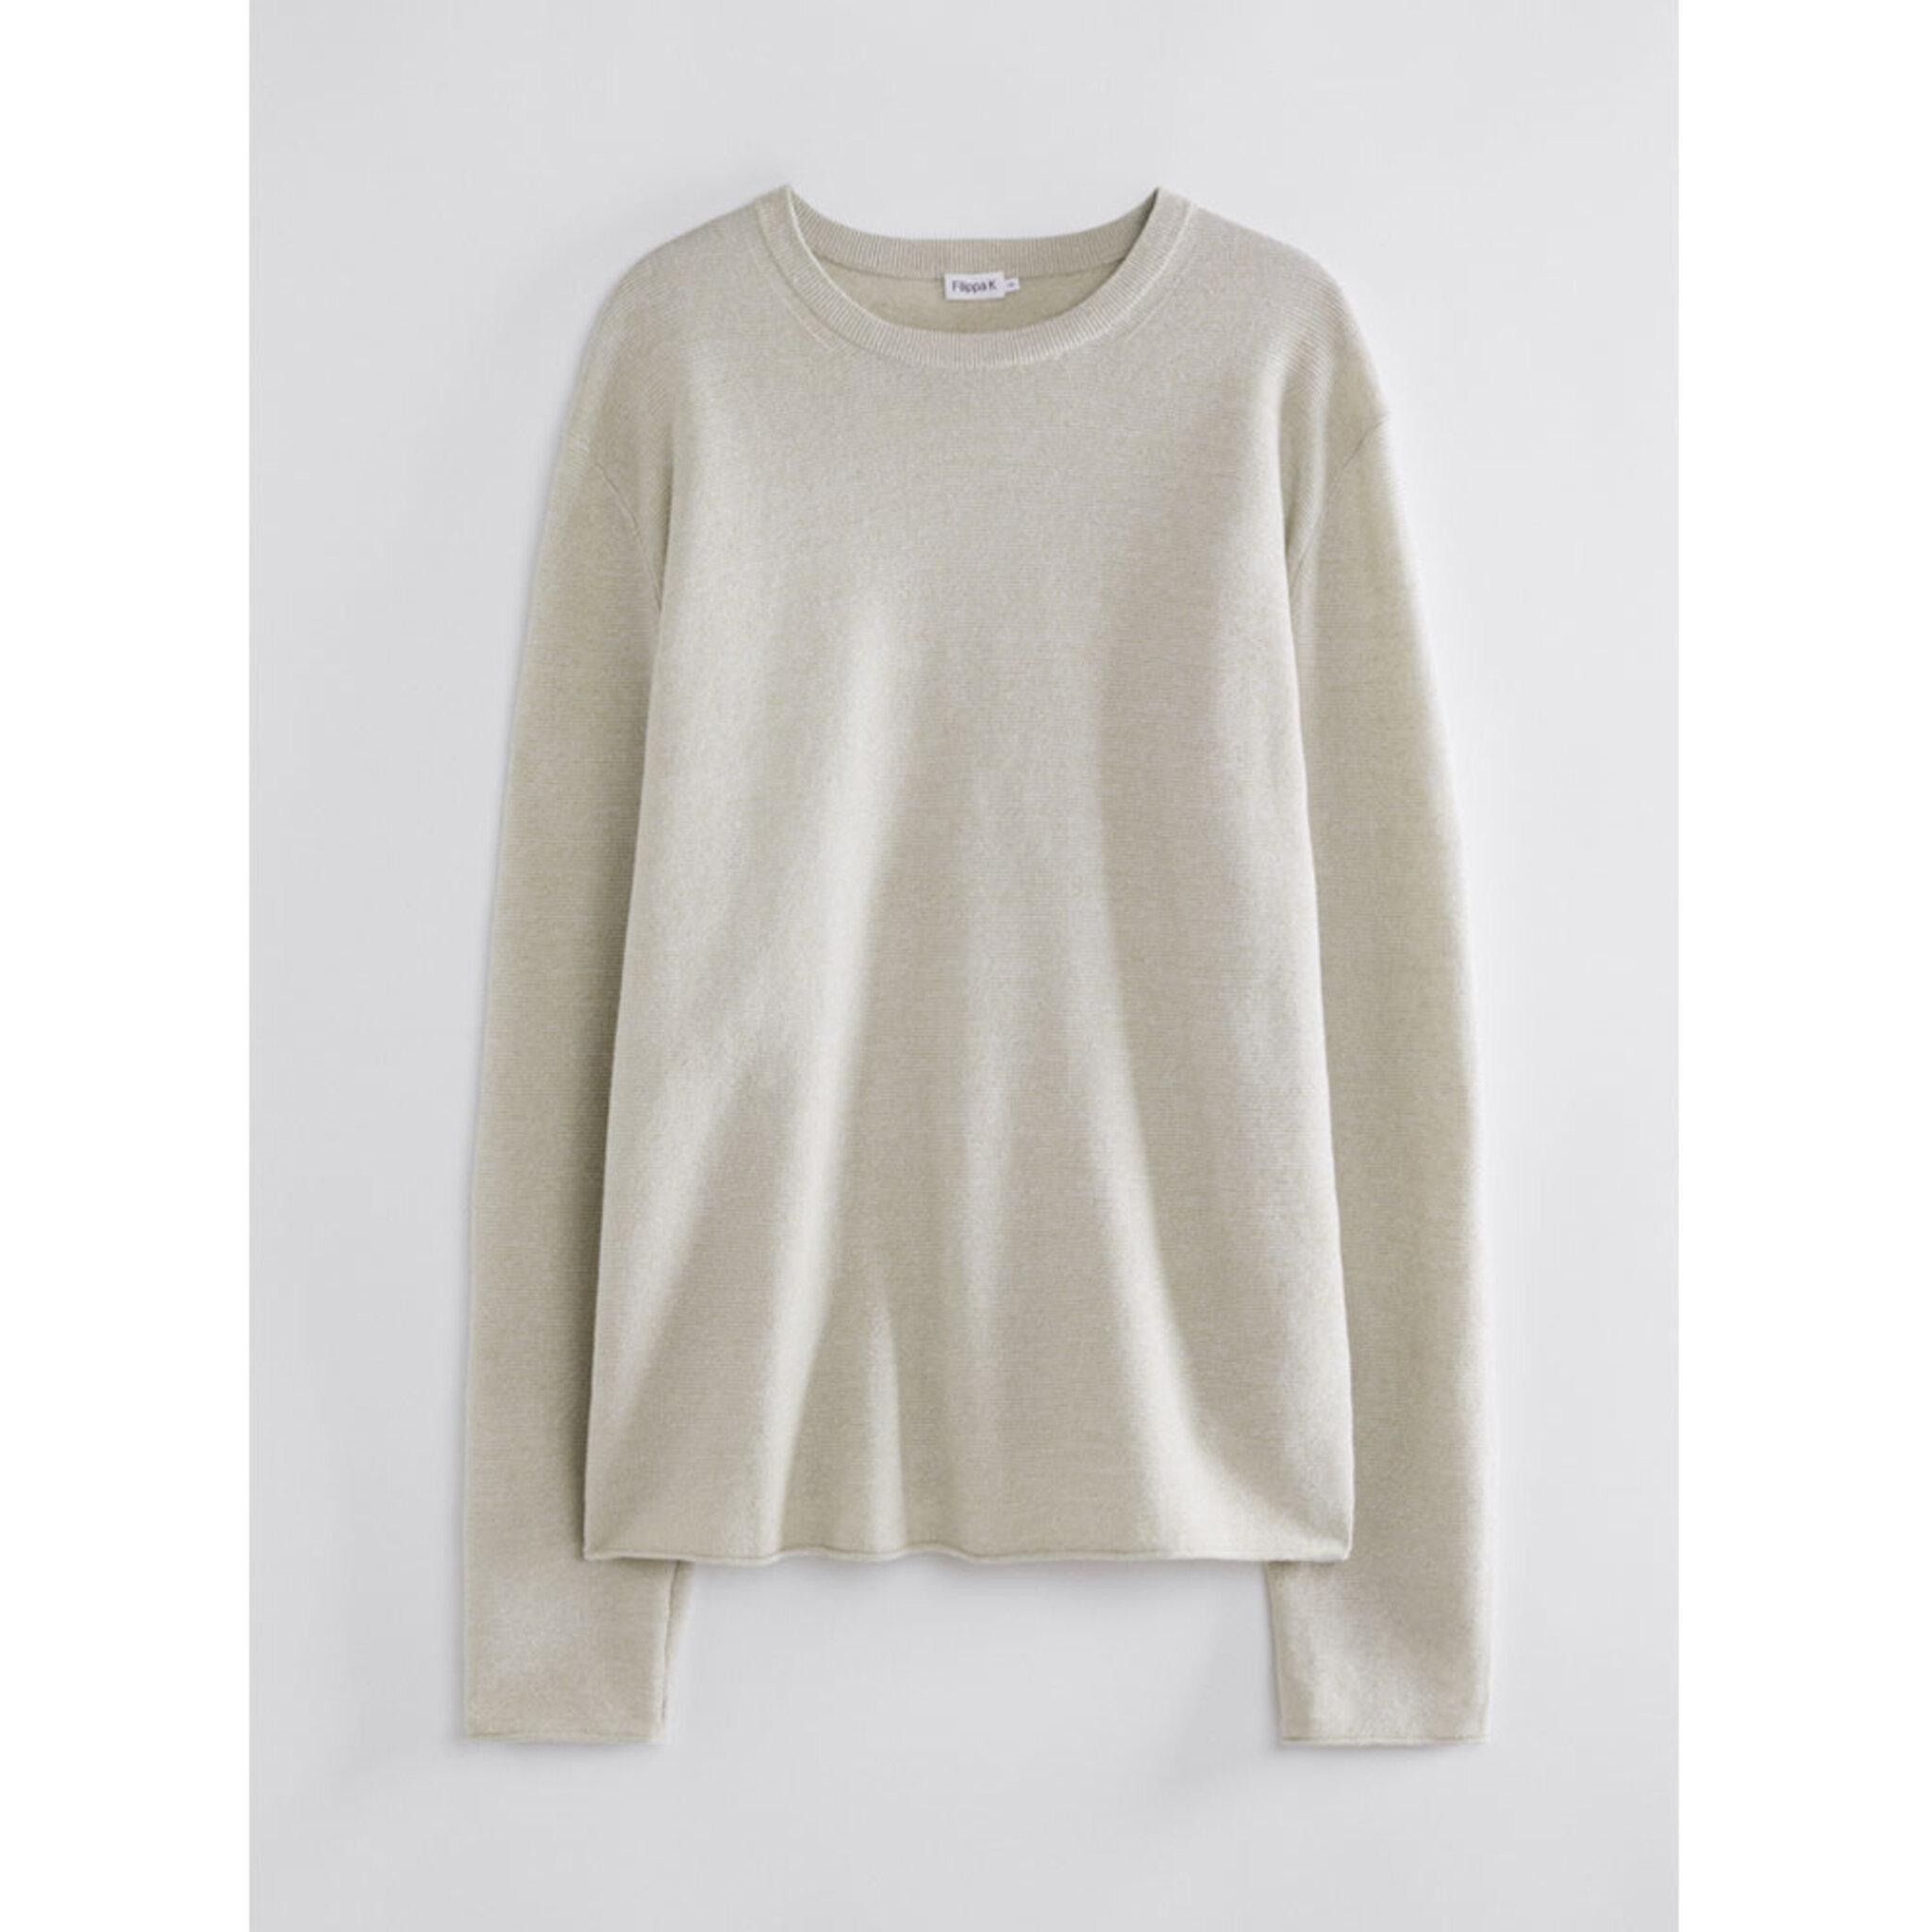 M. Tyler Sweater